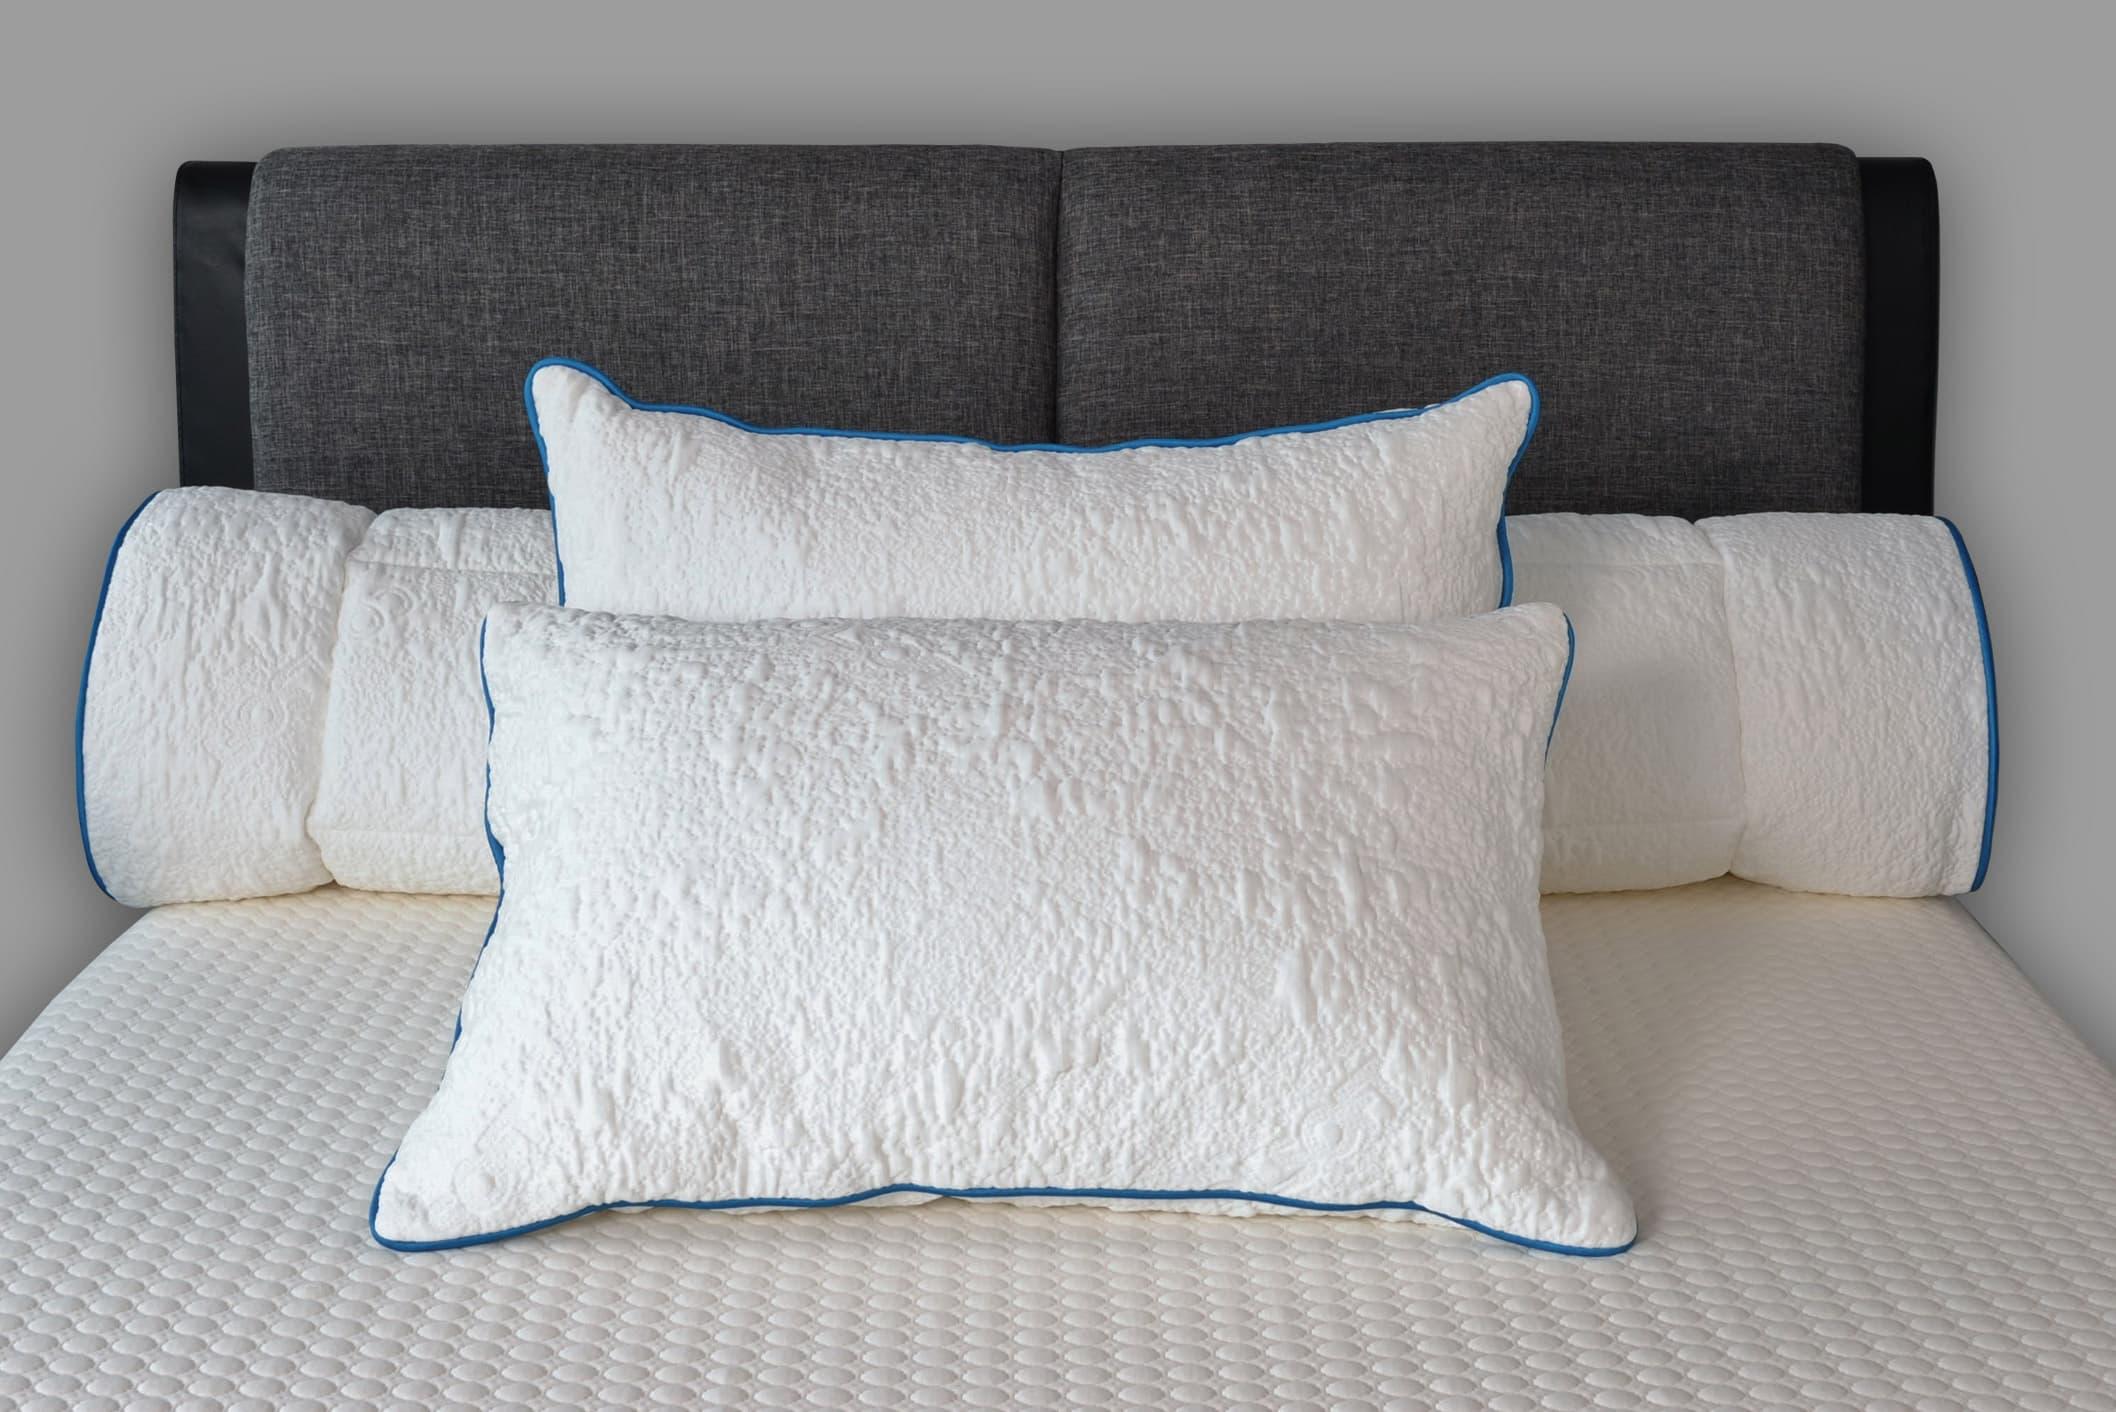 Therapedic mattress topper twin xl